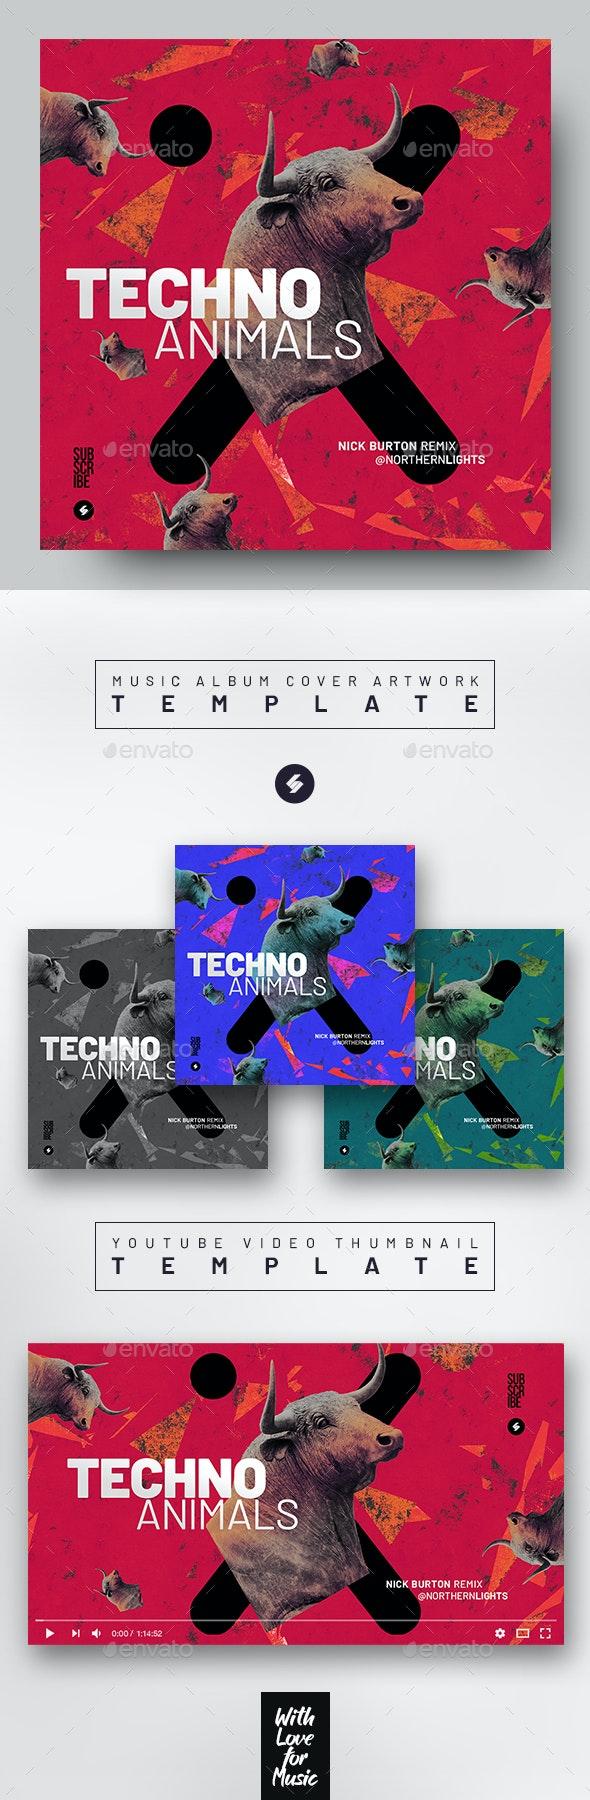 Techno Animals – Music Album Cover Artwork / Video Thumbnail Template - Miscellaneous Social Media